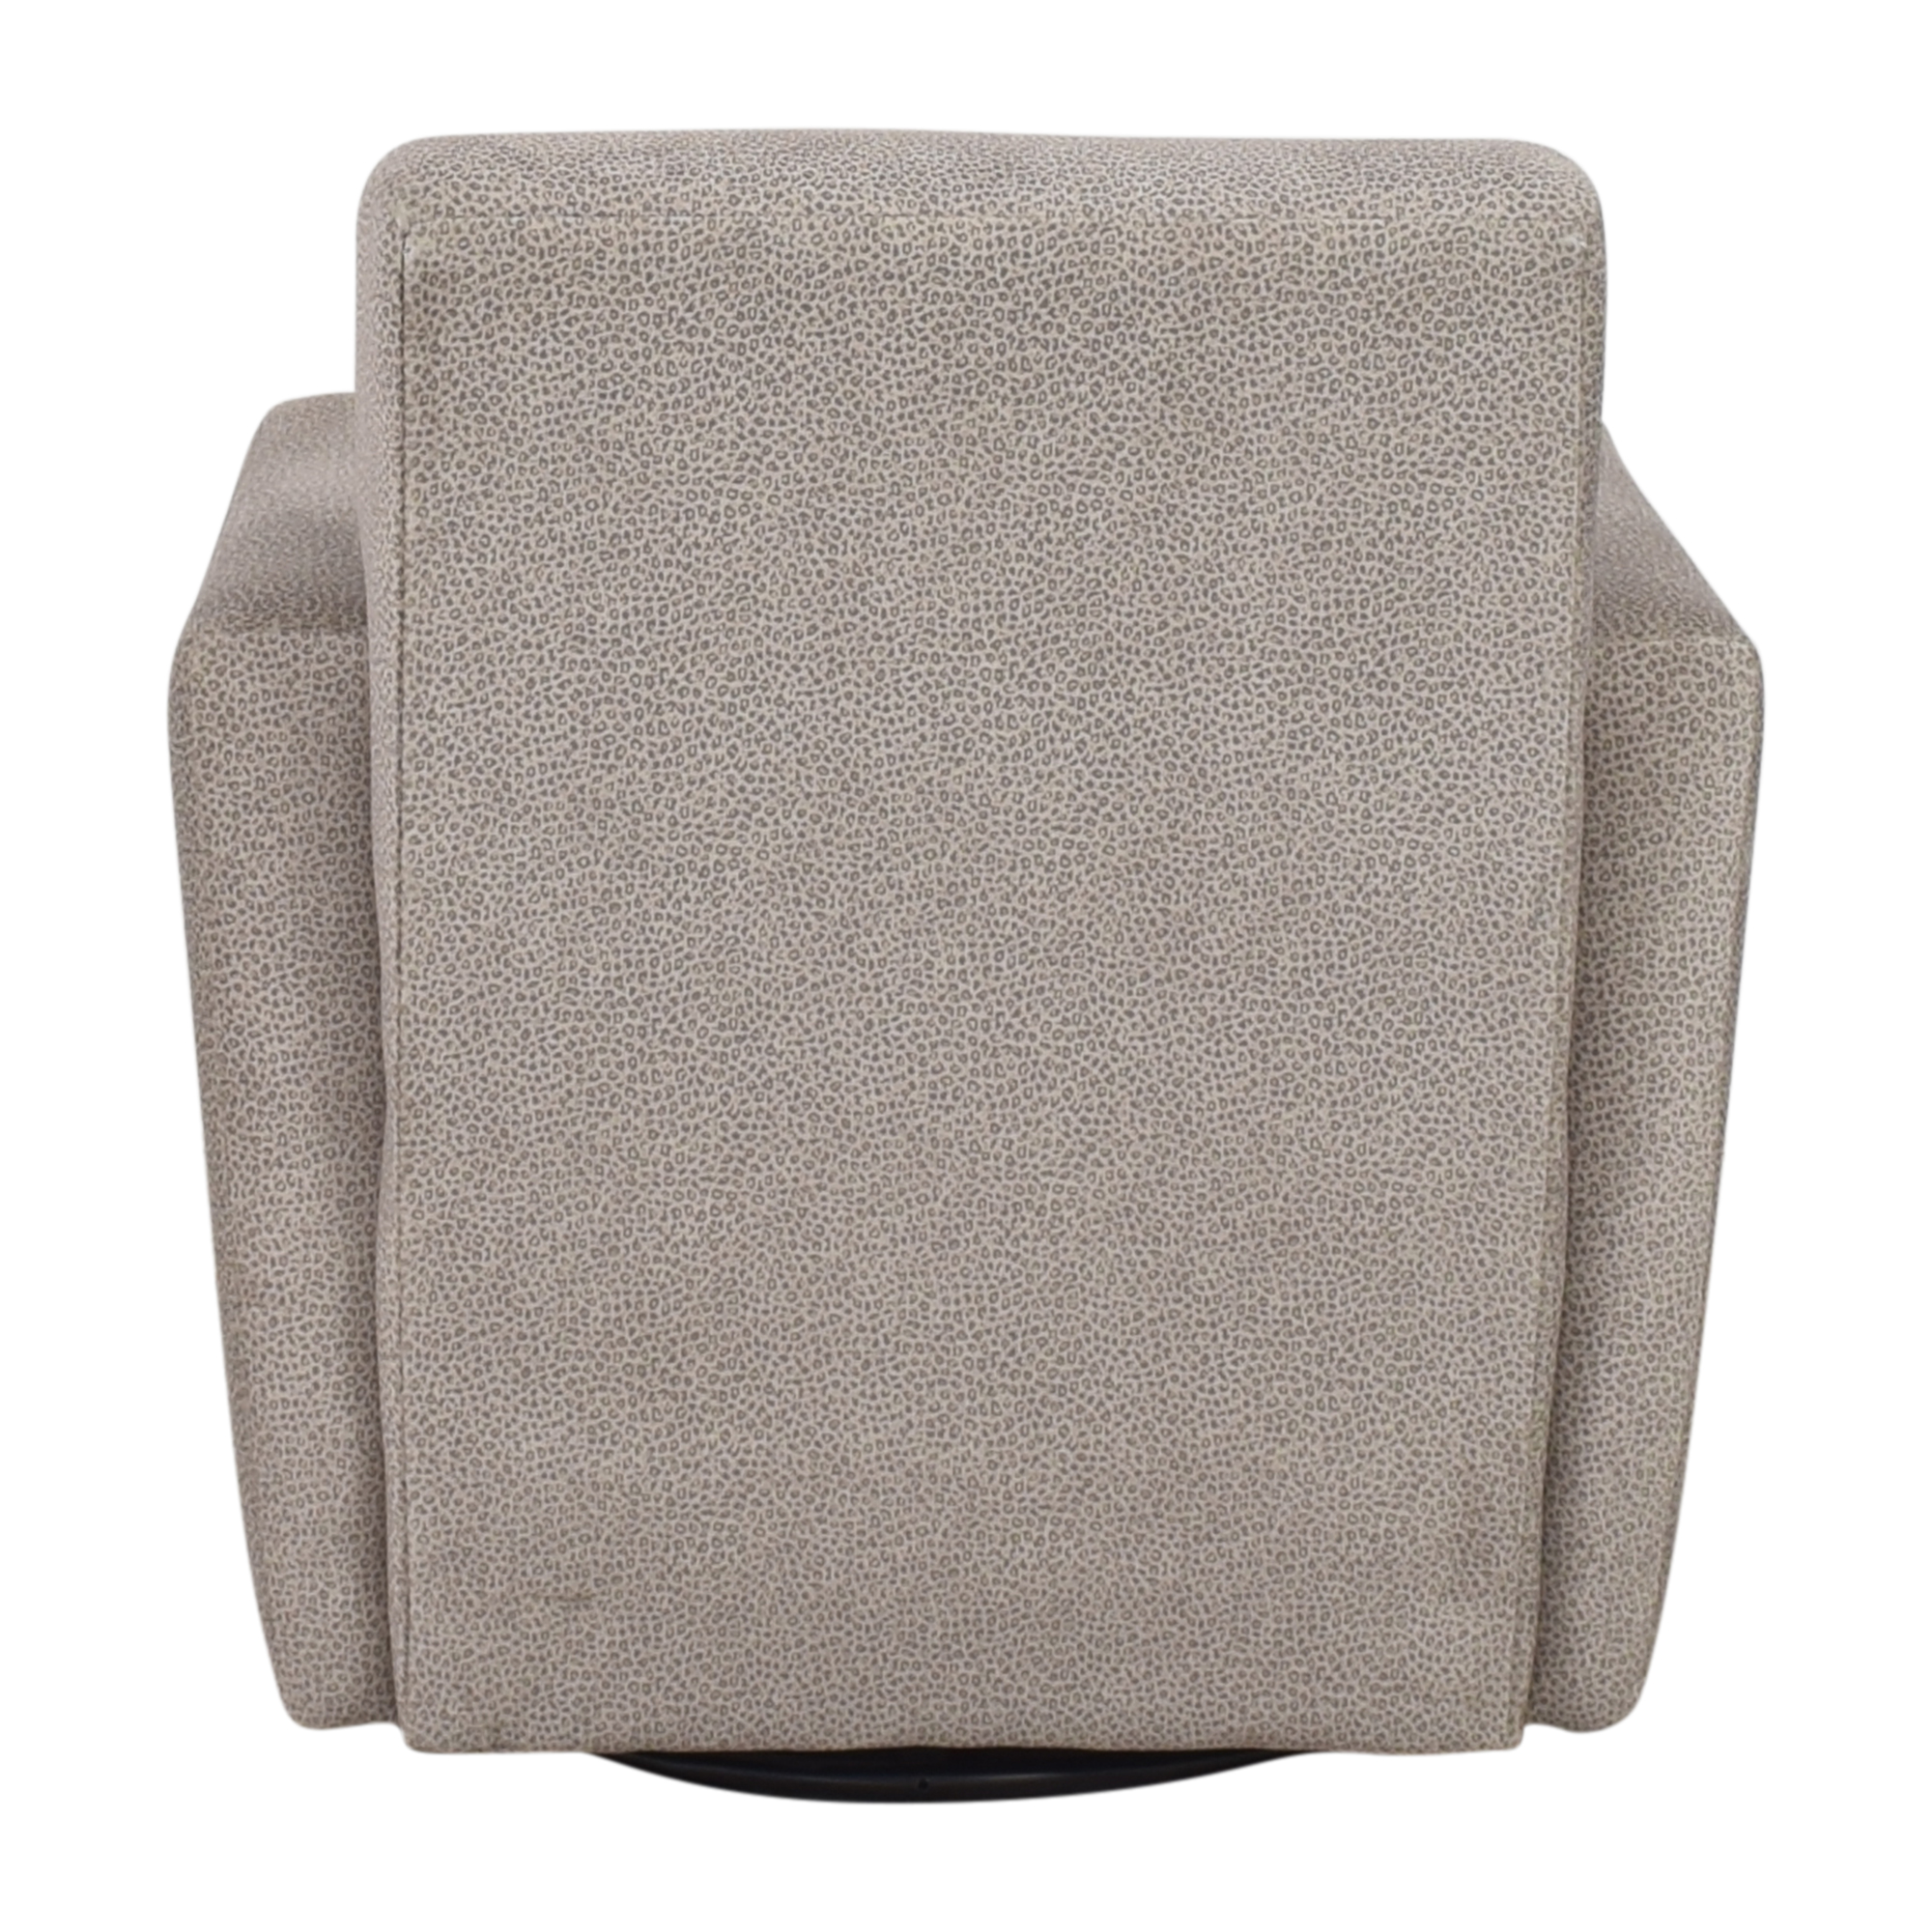 Macy's Macy's Ventura Swivel Chair Accent Chairs